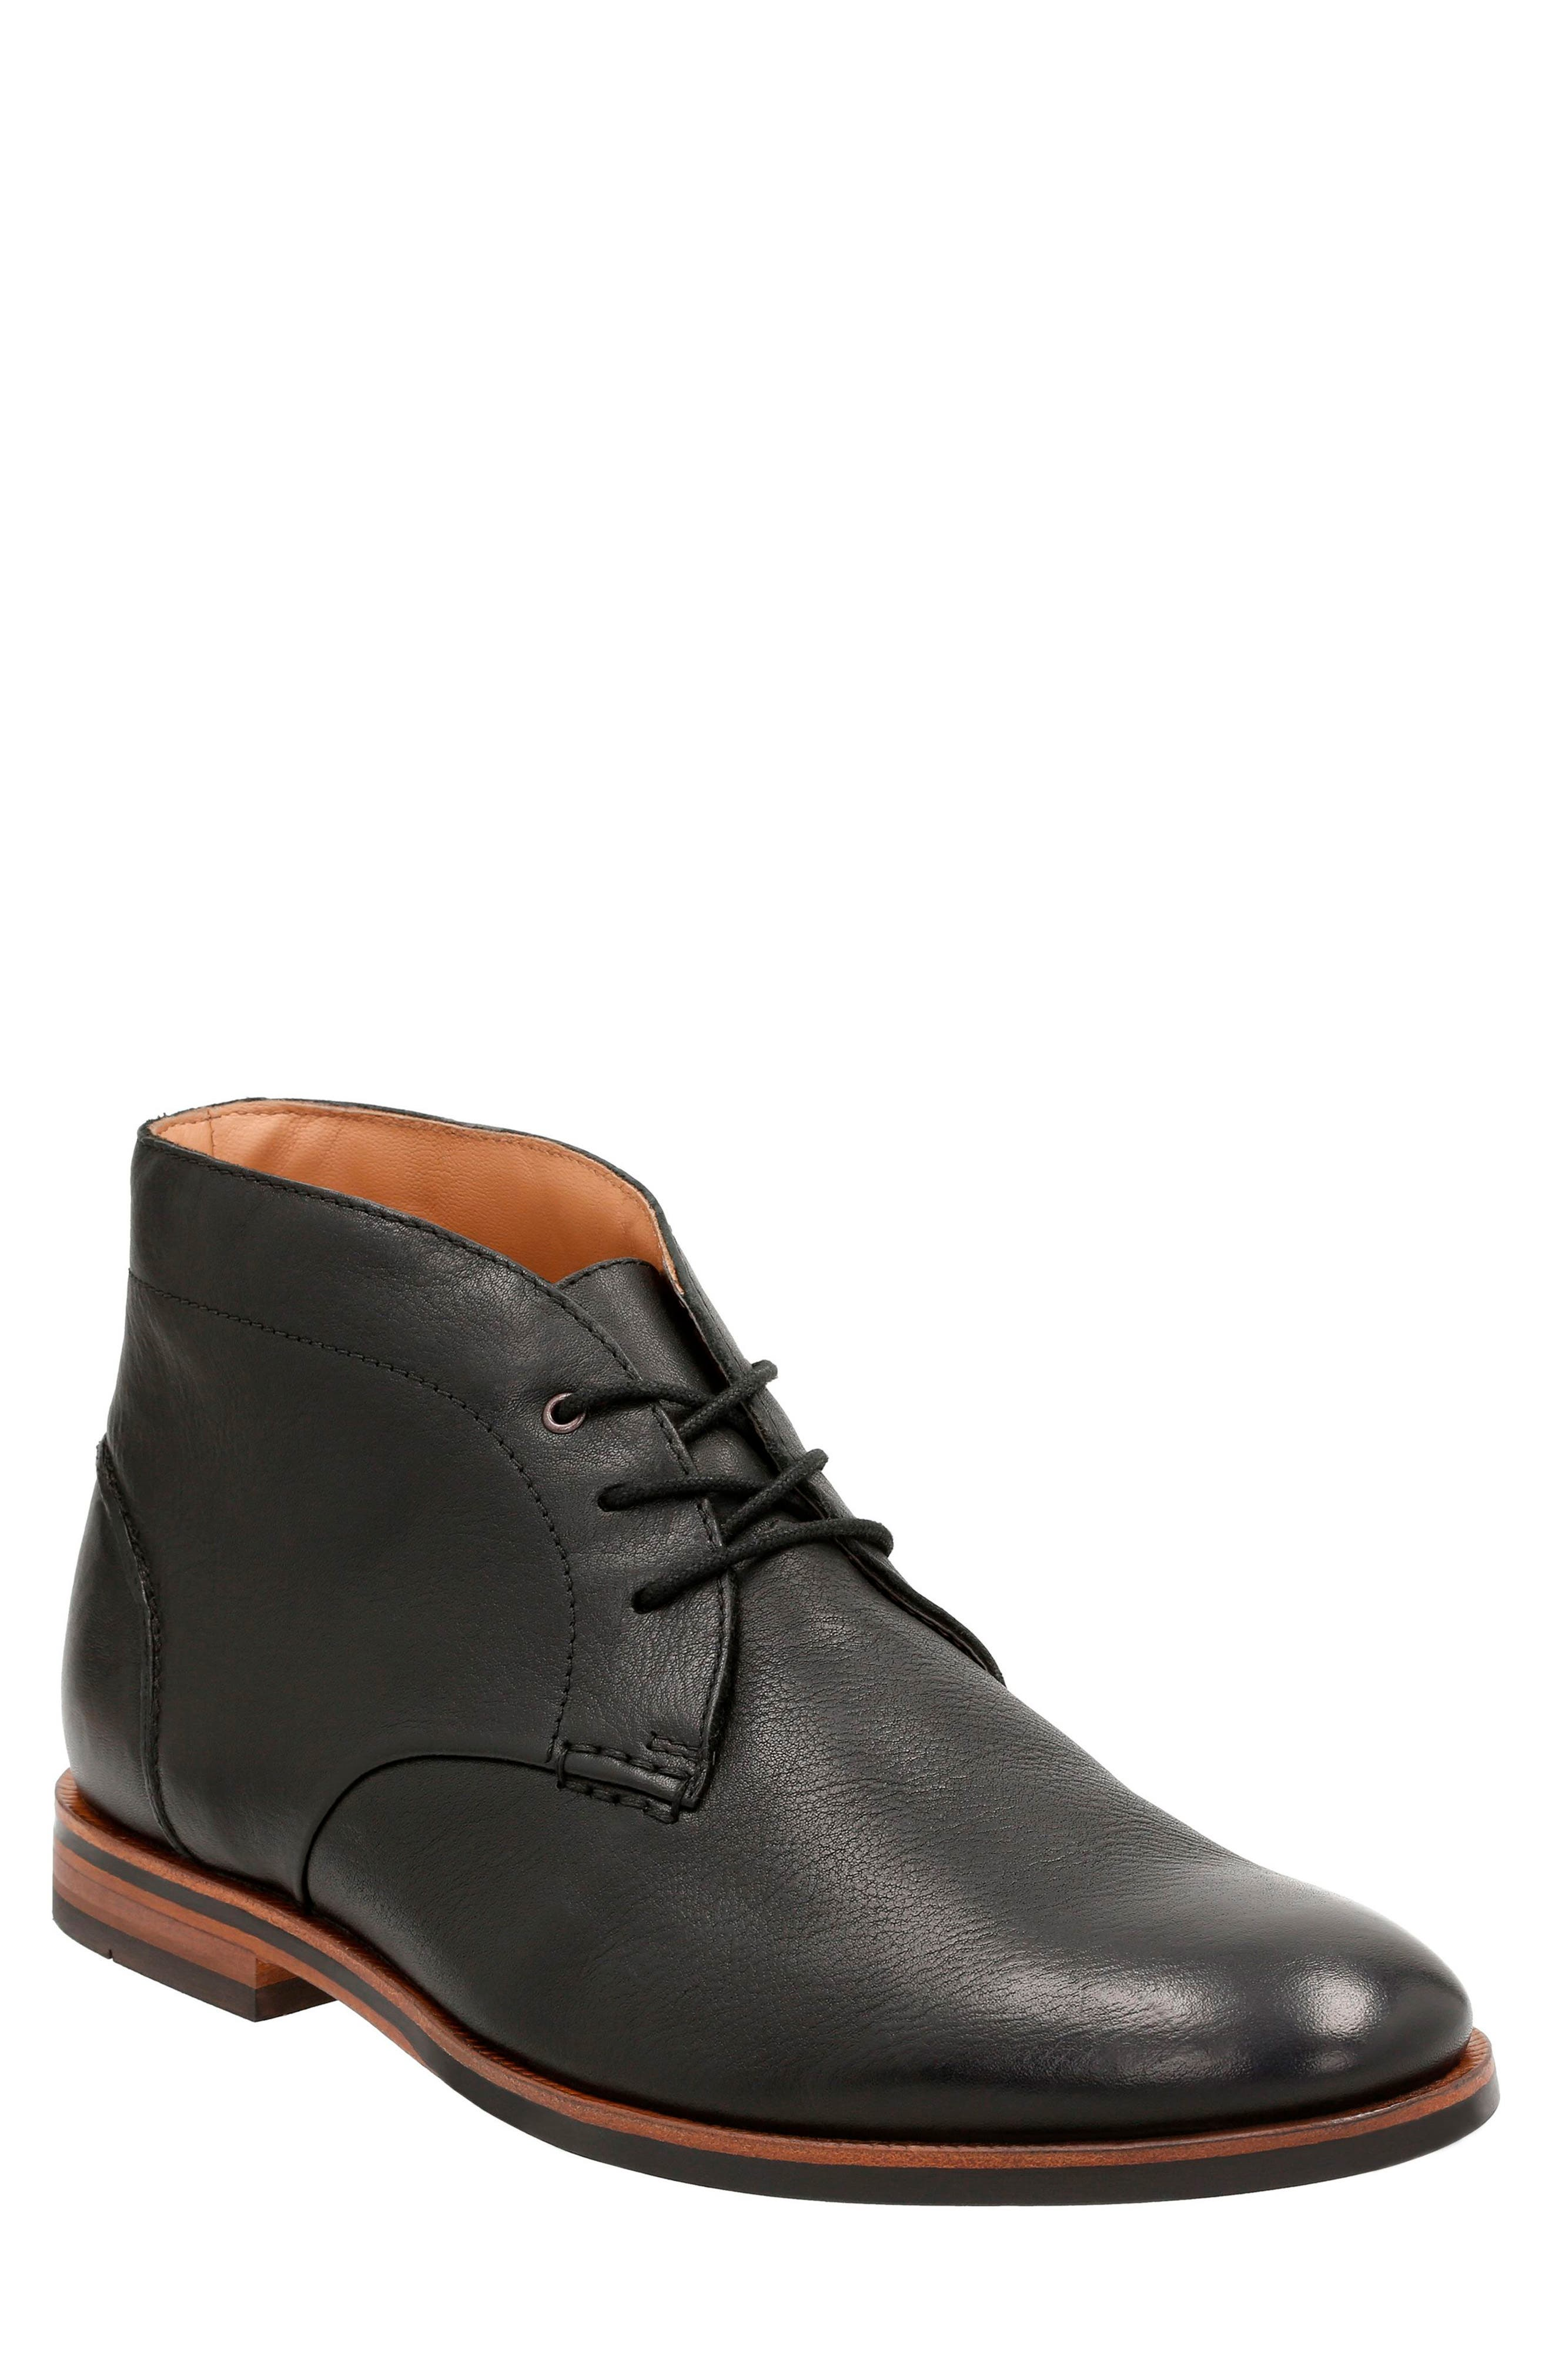 Broyd Mid Chukka Boot, Main, color, 003